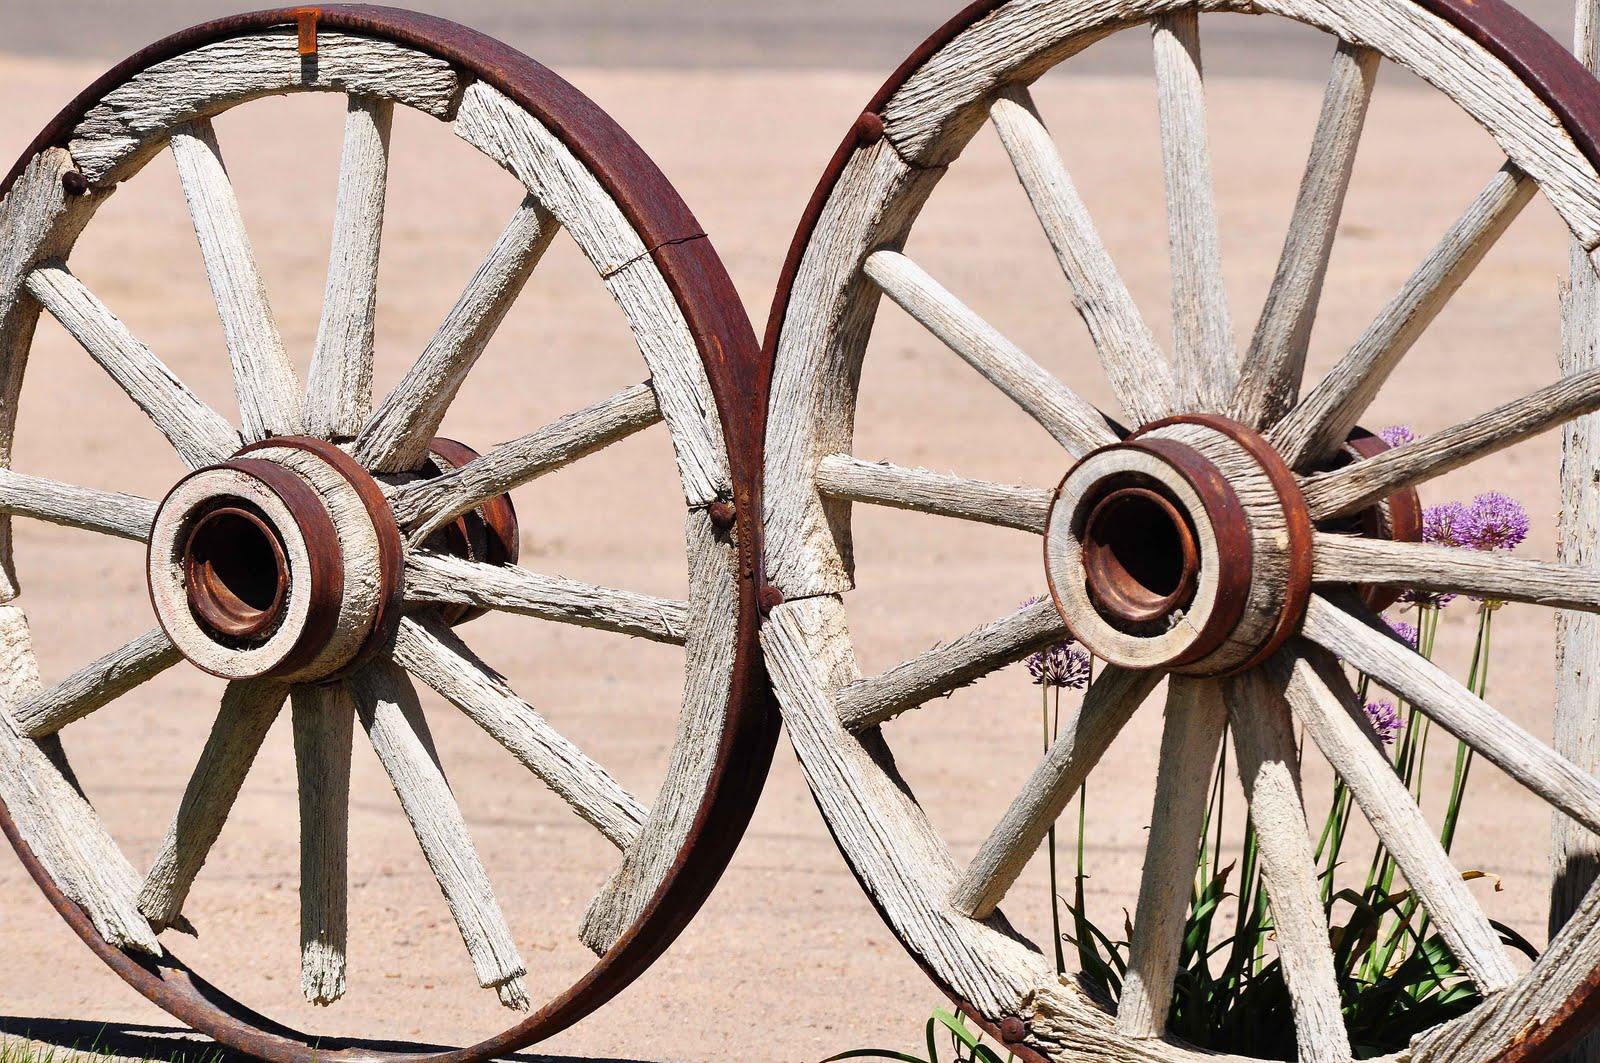 Western Wagon Wheel Colorado wagon wheels